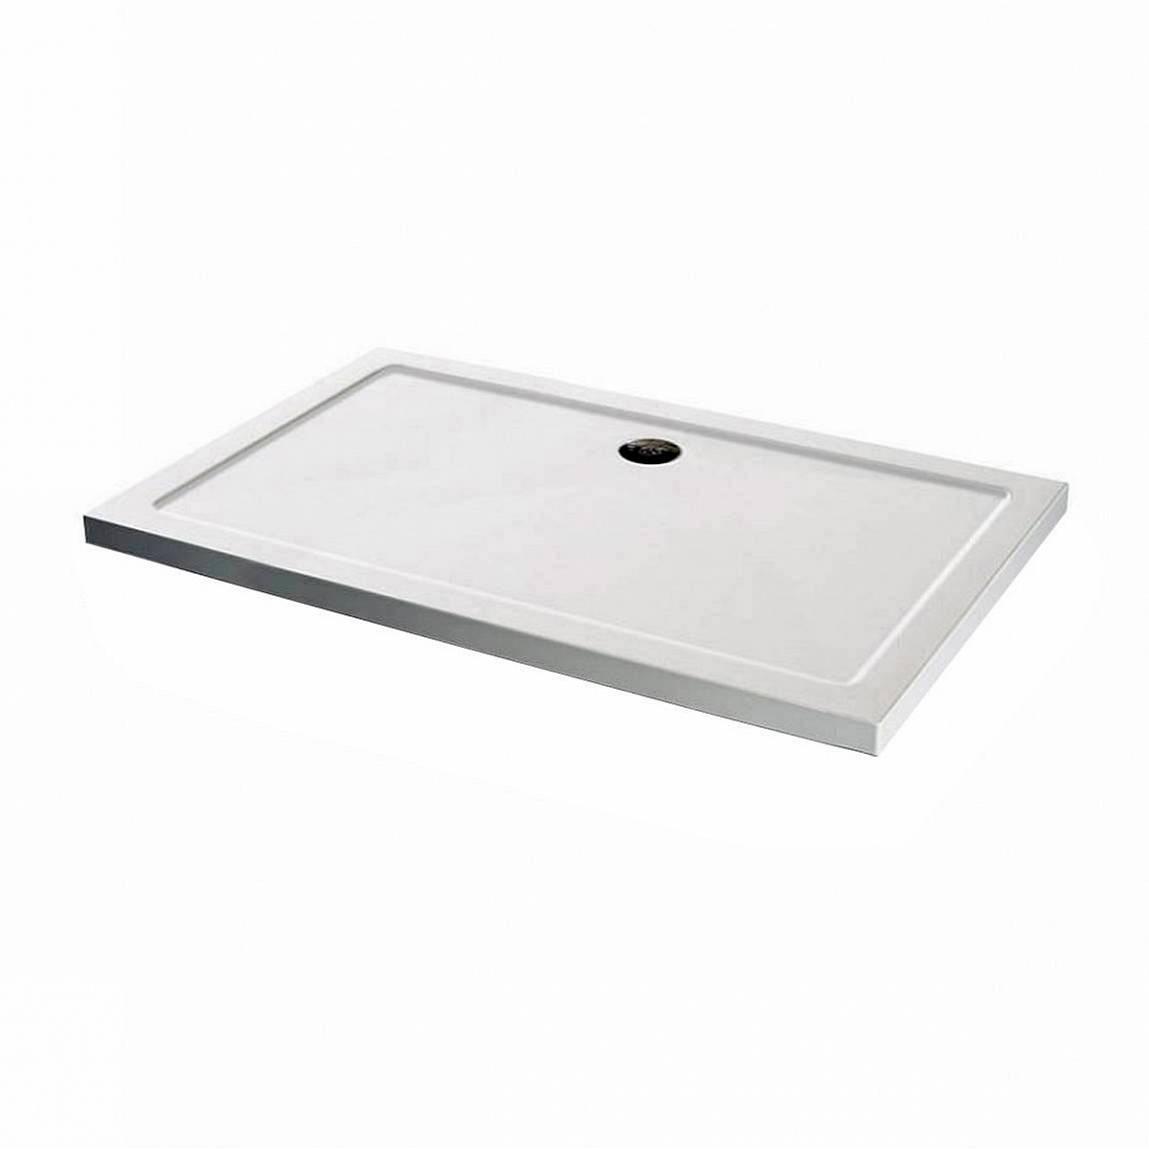 Image of Rectangular Stone Shower Tray 900 X 800